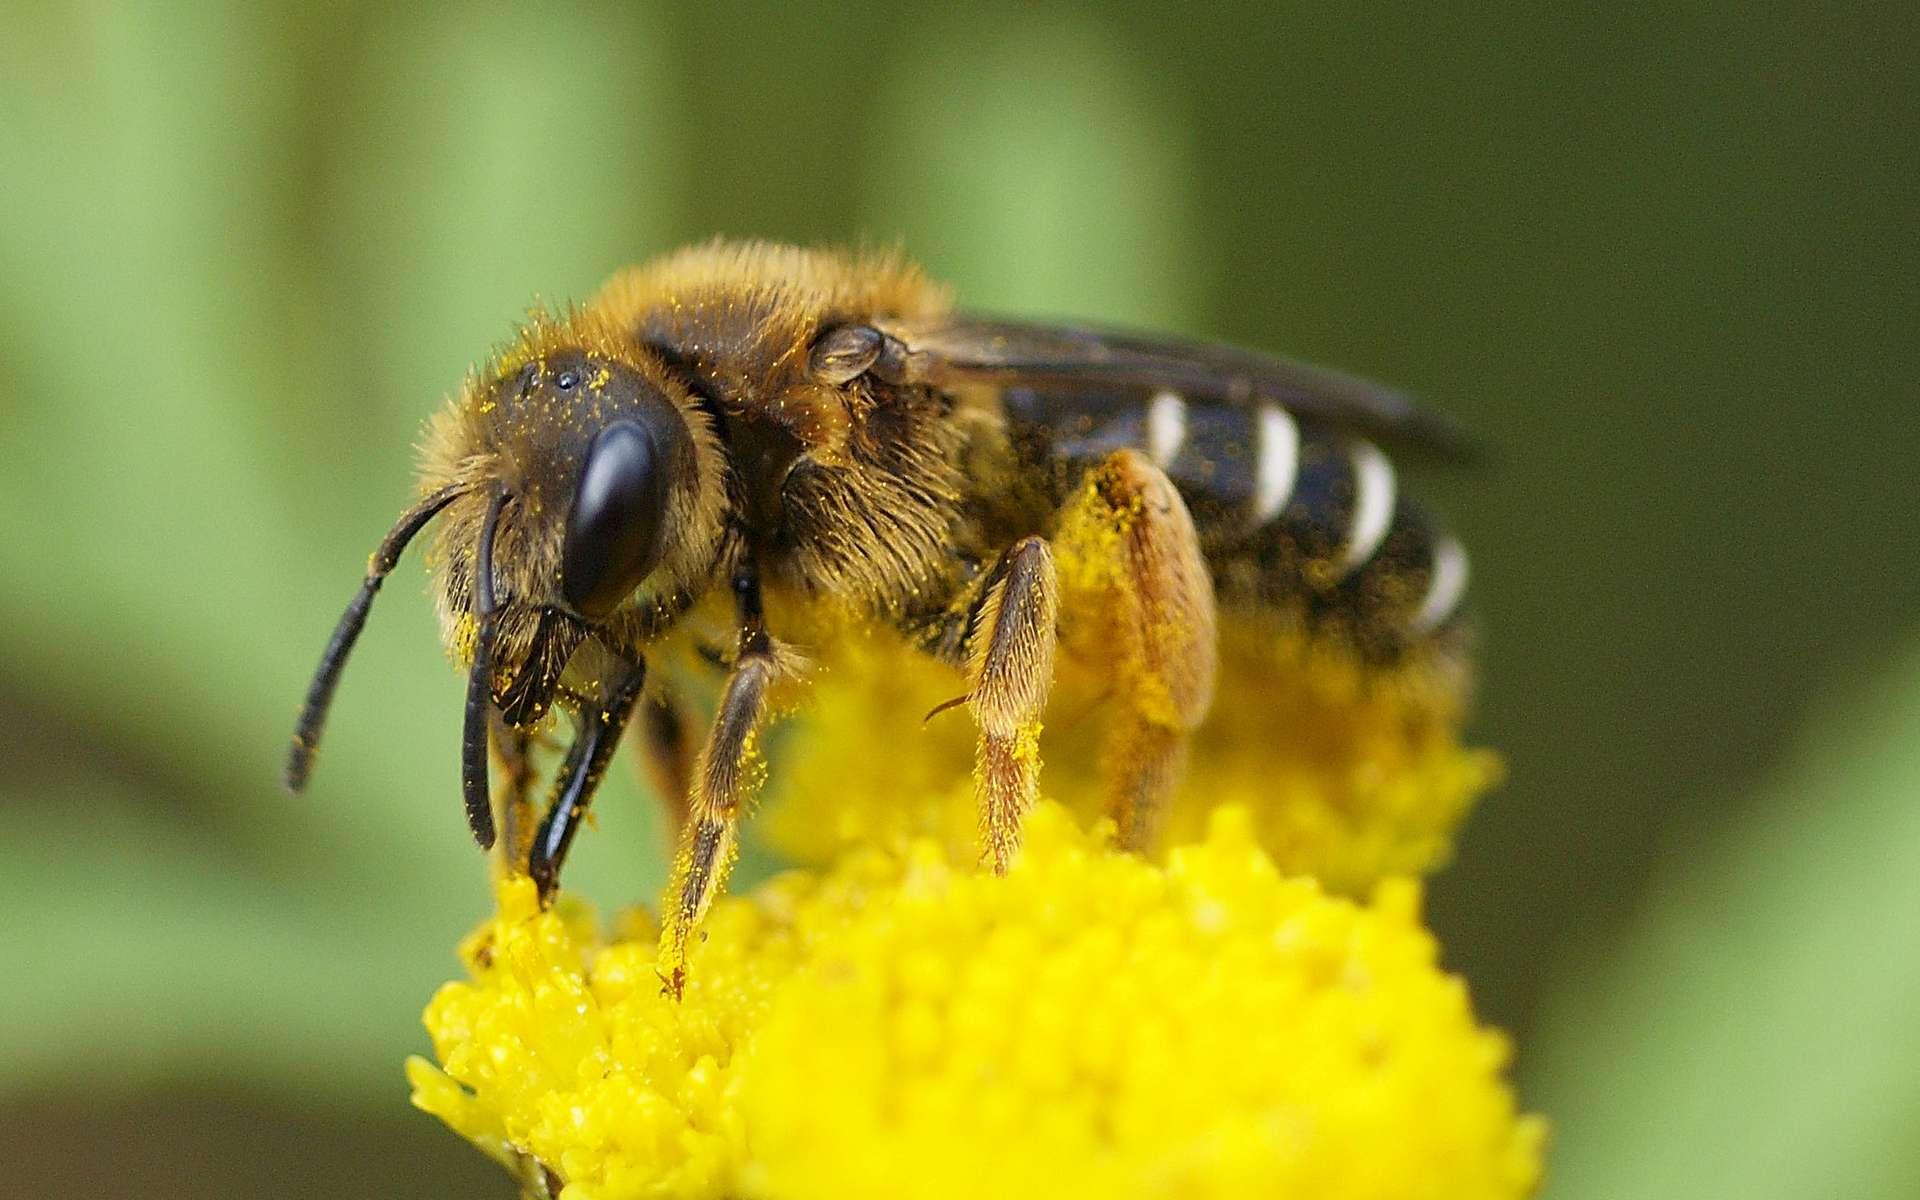 Une abeille de la famille de Halictidae. Ici Halictidae rubicundus. © linsepatron, Wikimédias, CC by-sa 2.0